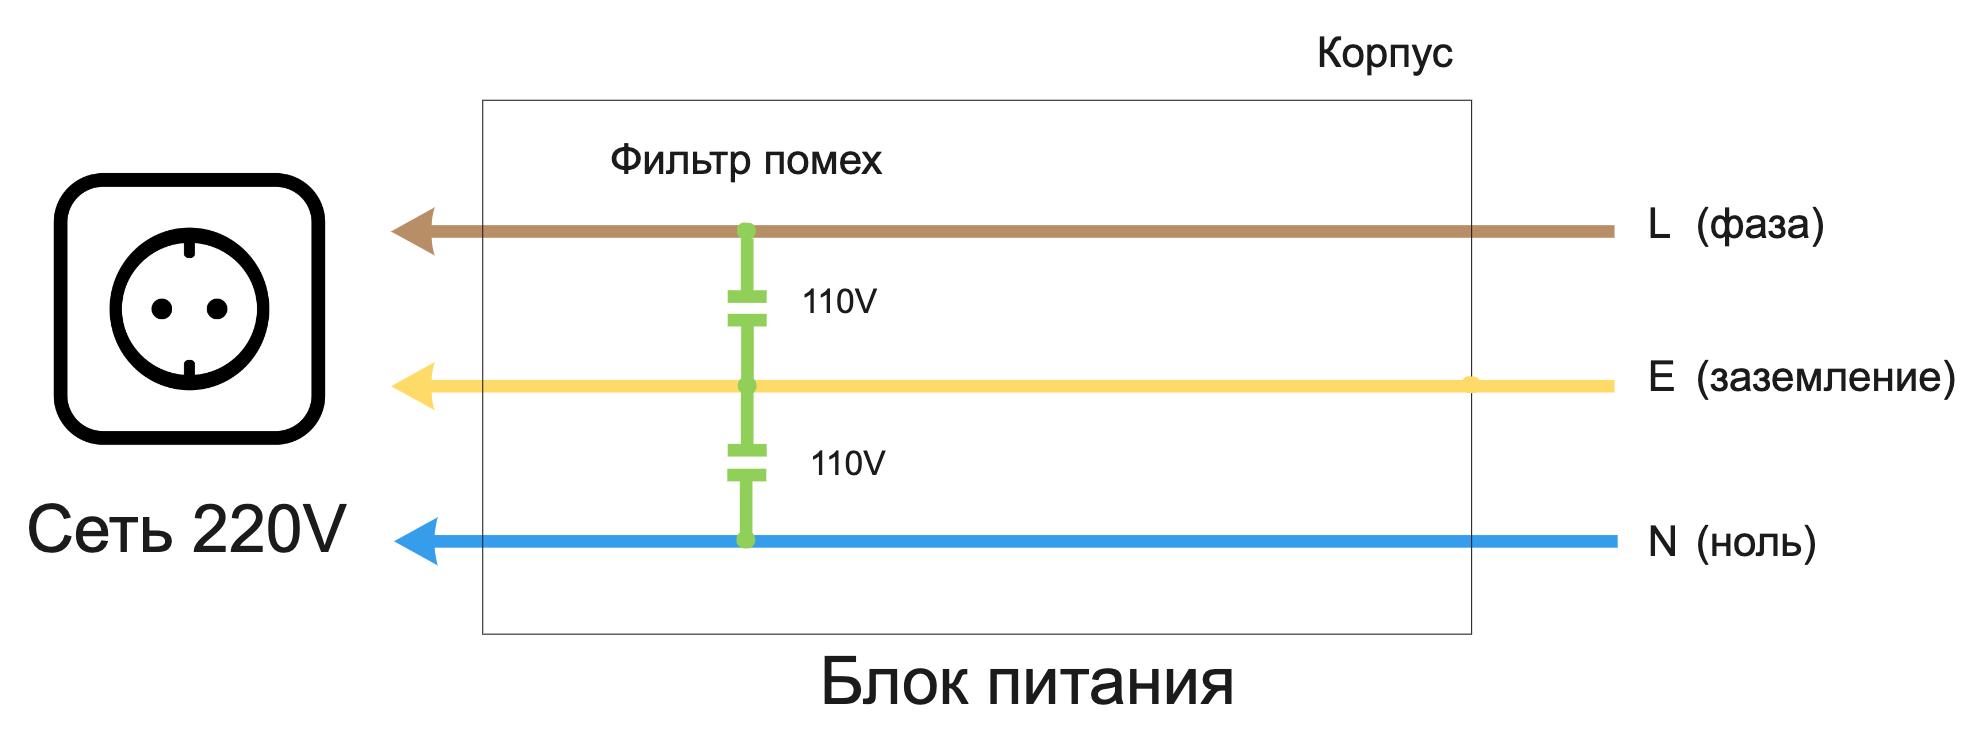 Ovirt за 2 часа. часть 1. открытая отказоустойчивая платформа виртуализации / хабр